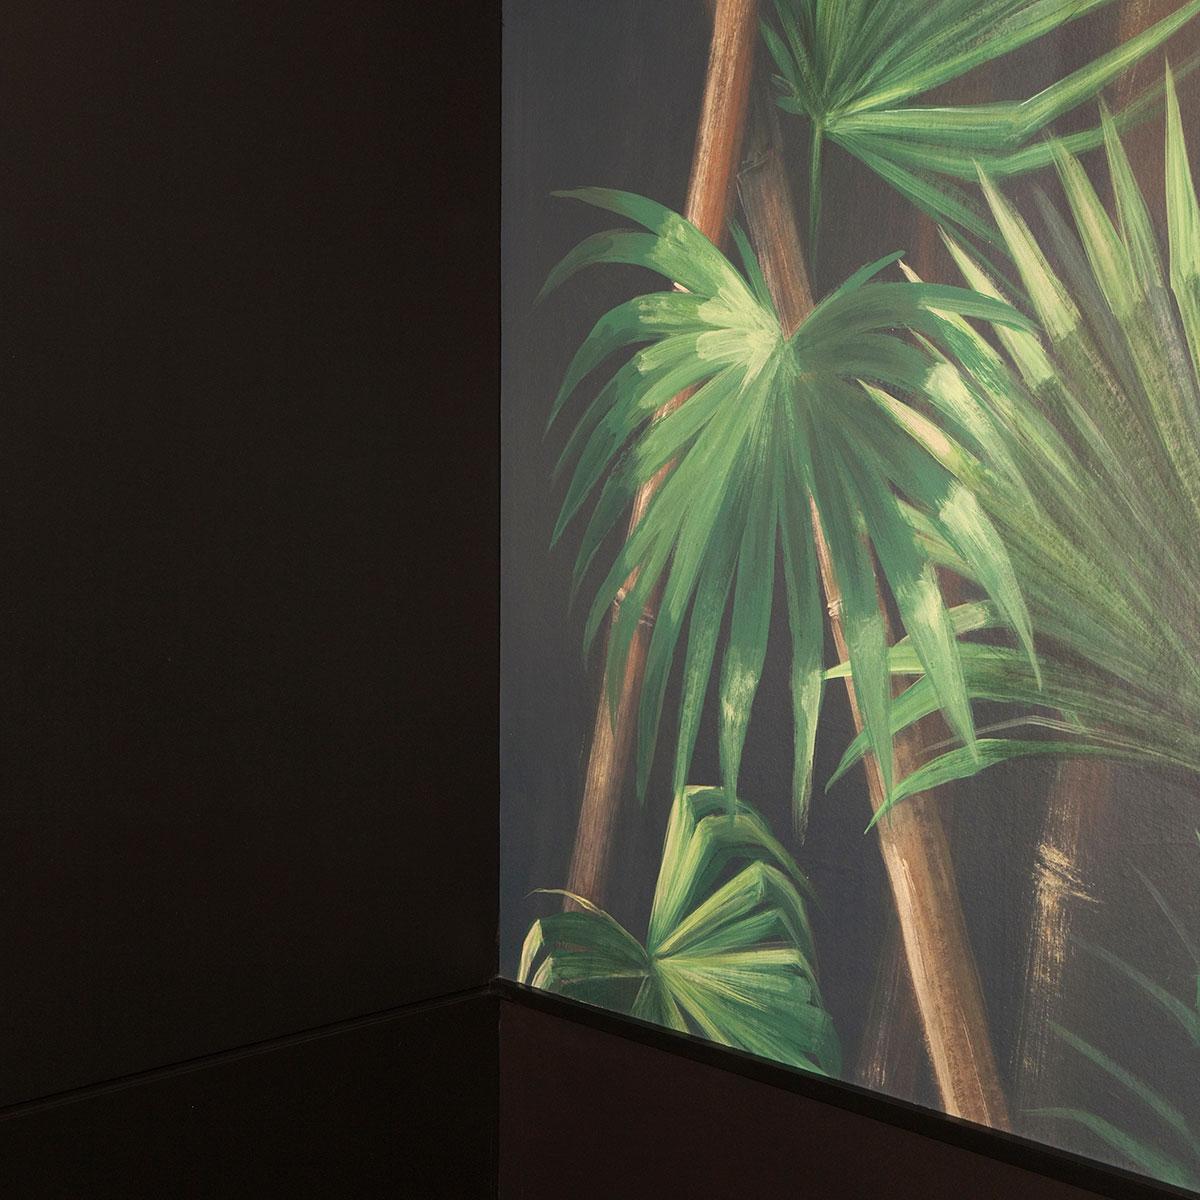 kickoffice casa dgr bathroom wallpaper leaves bamboo kerakoll pictalab